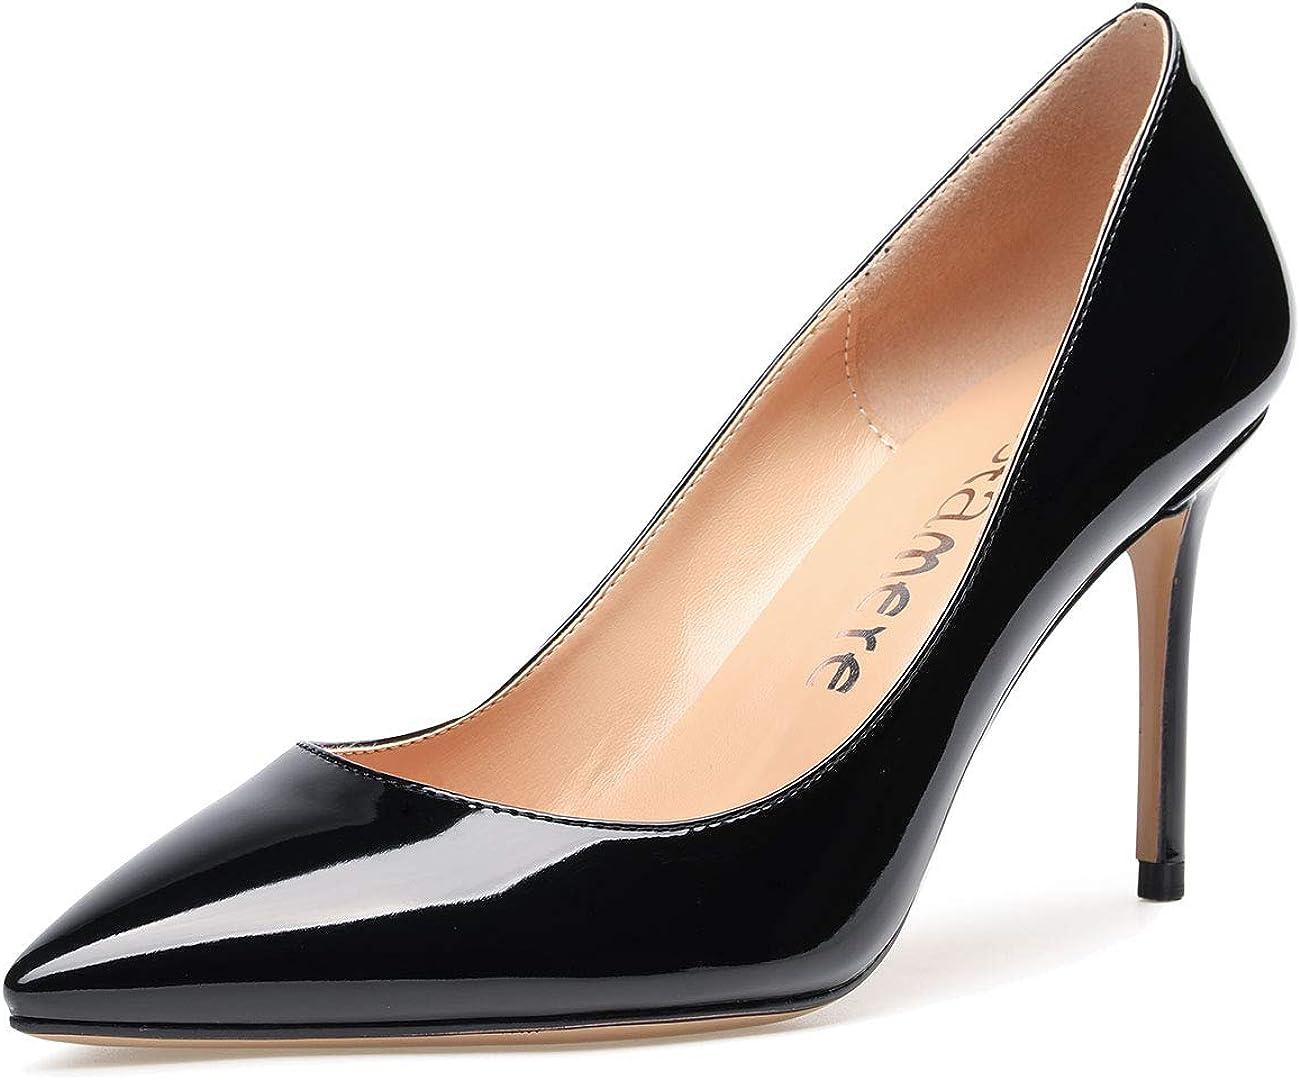 CASTAMERE High Heels Womens Pointed Toe Slip-on Pumps 8.5CM Heels